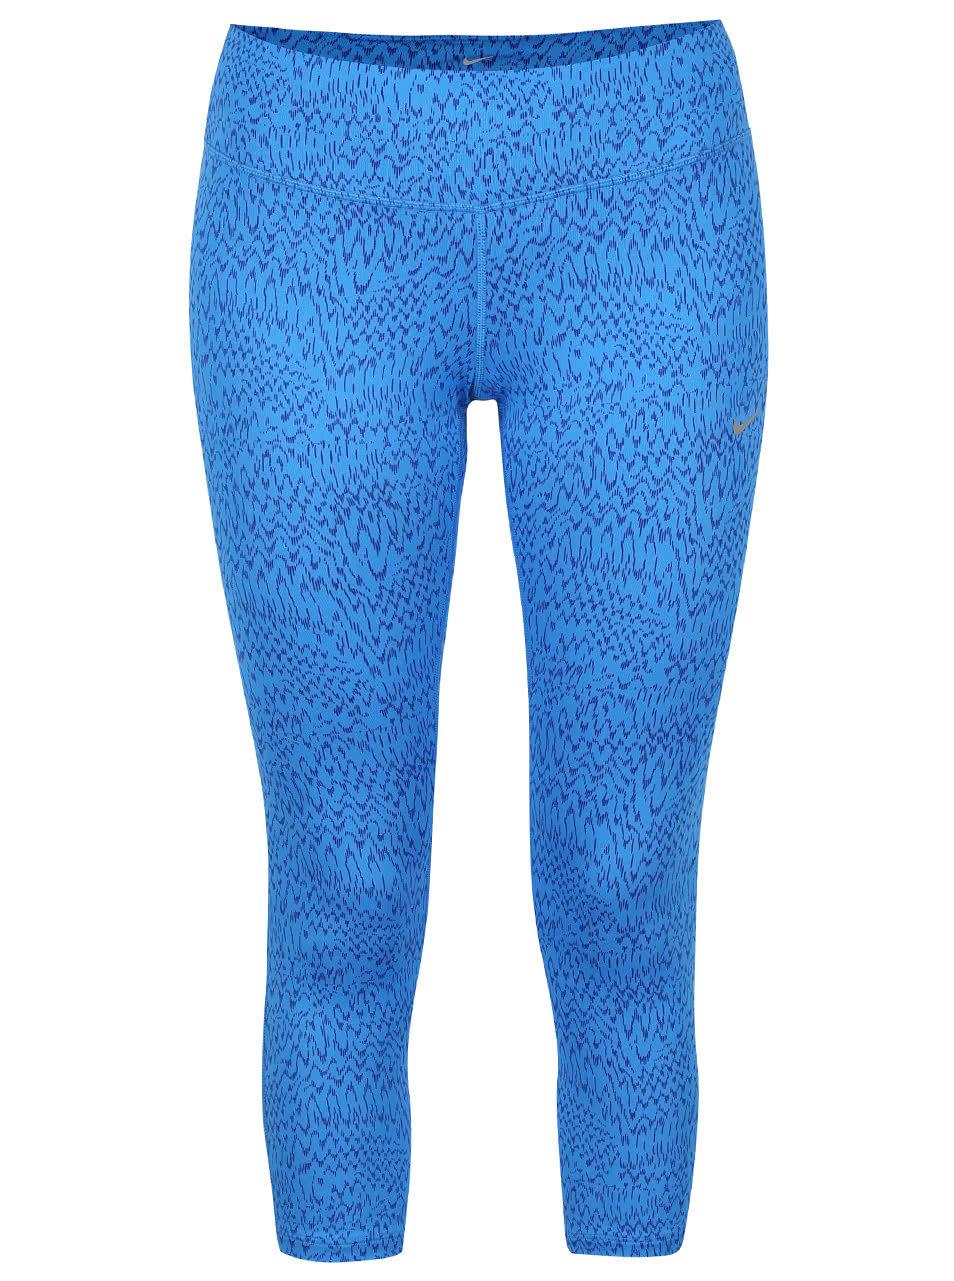 dbdce941a25 Modré dámské 3 4 vzorované legíny Nike Power Epic Run ...